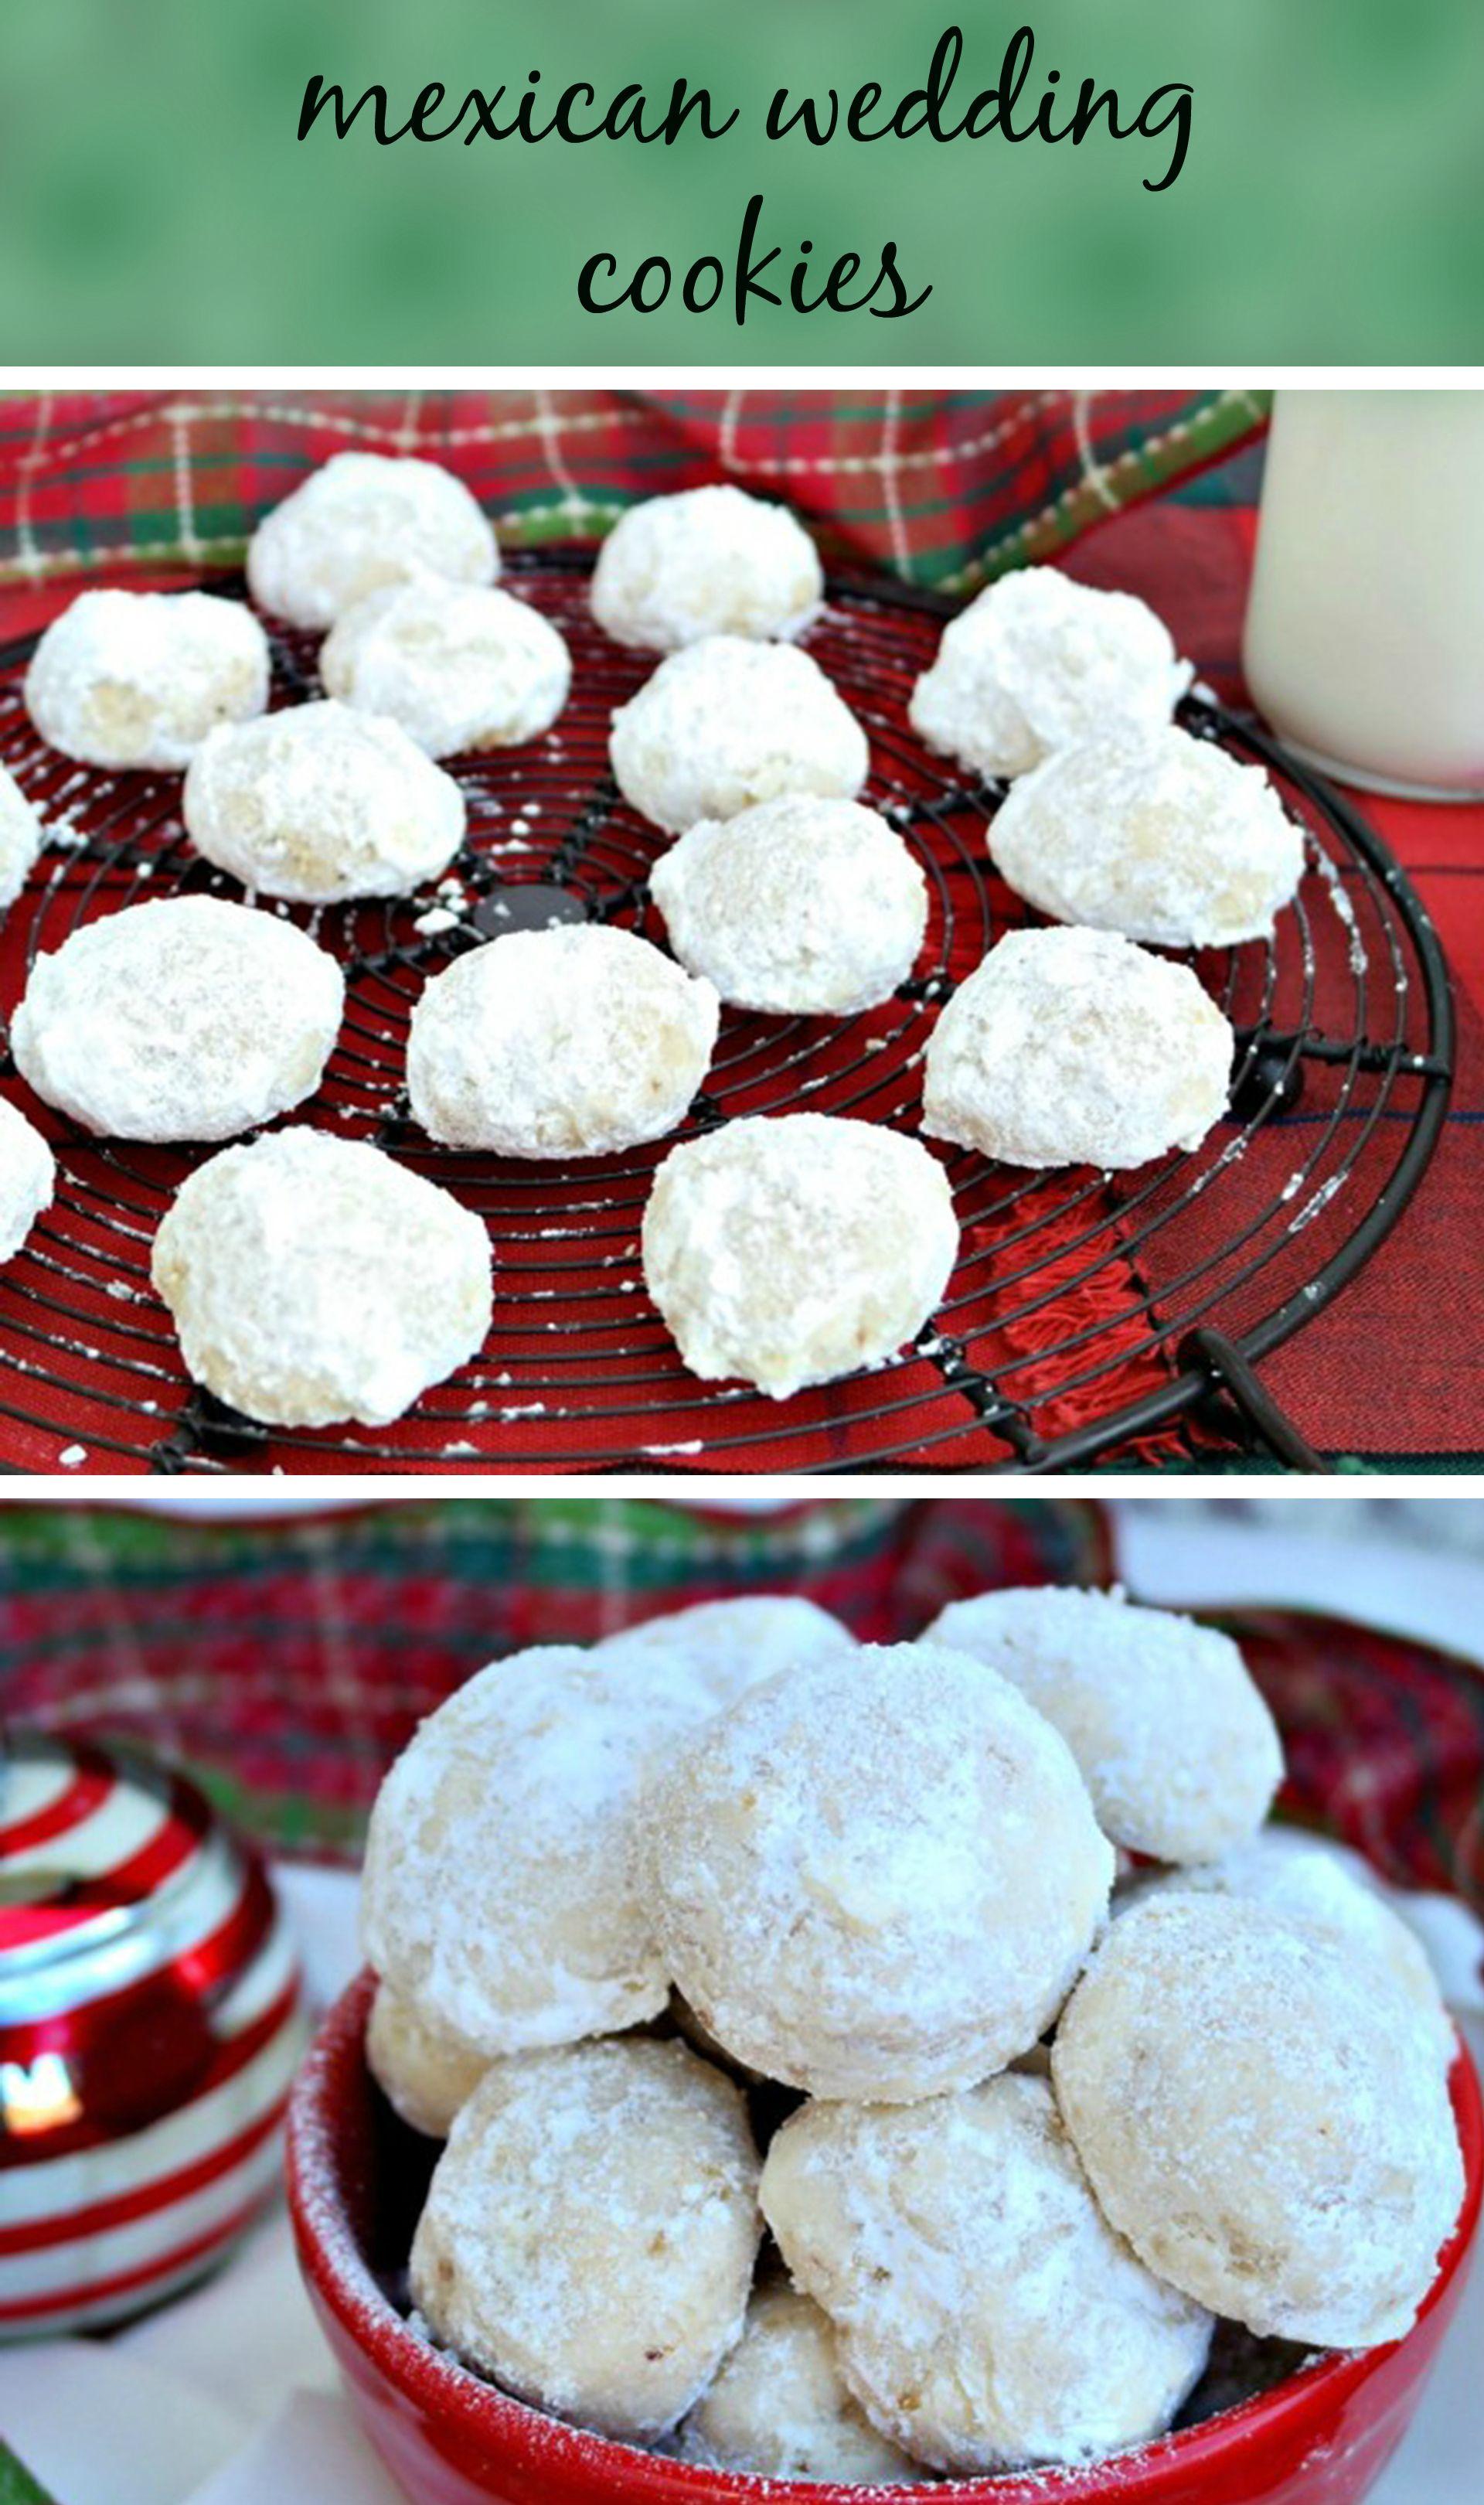 Mexican Wedding Cookies Recipe Honeybun cake recipe